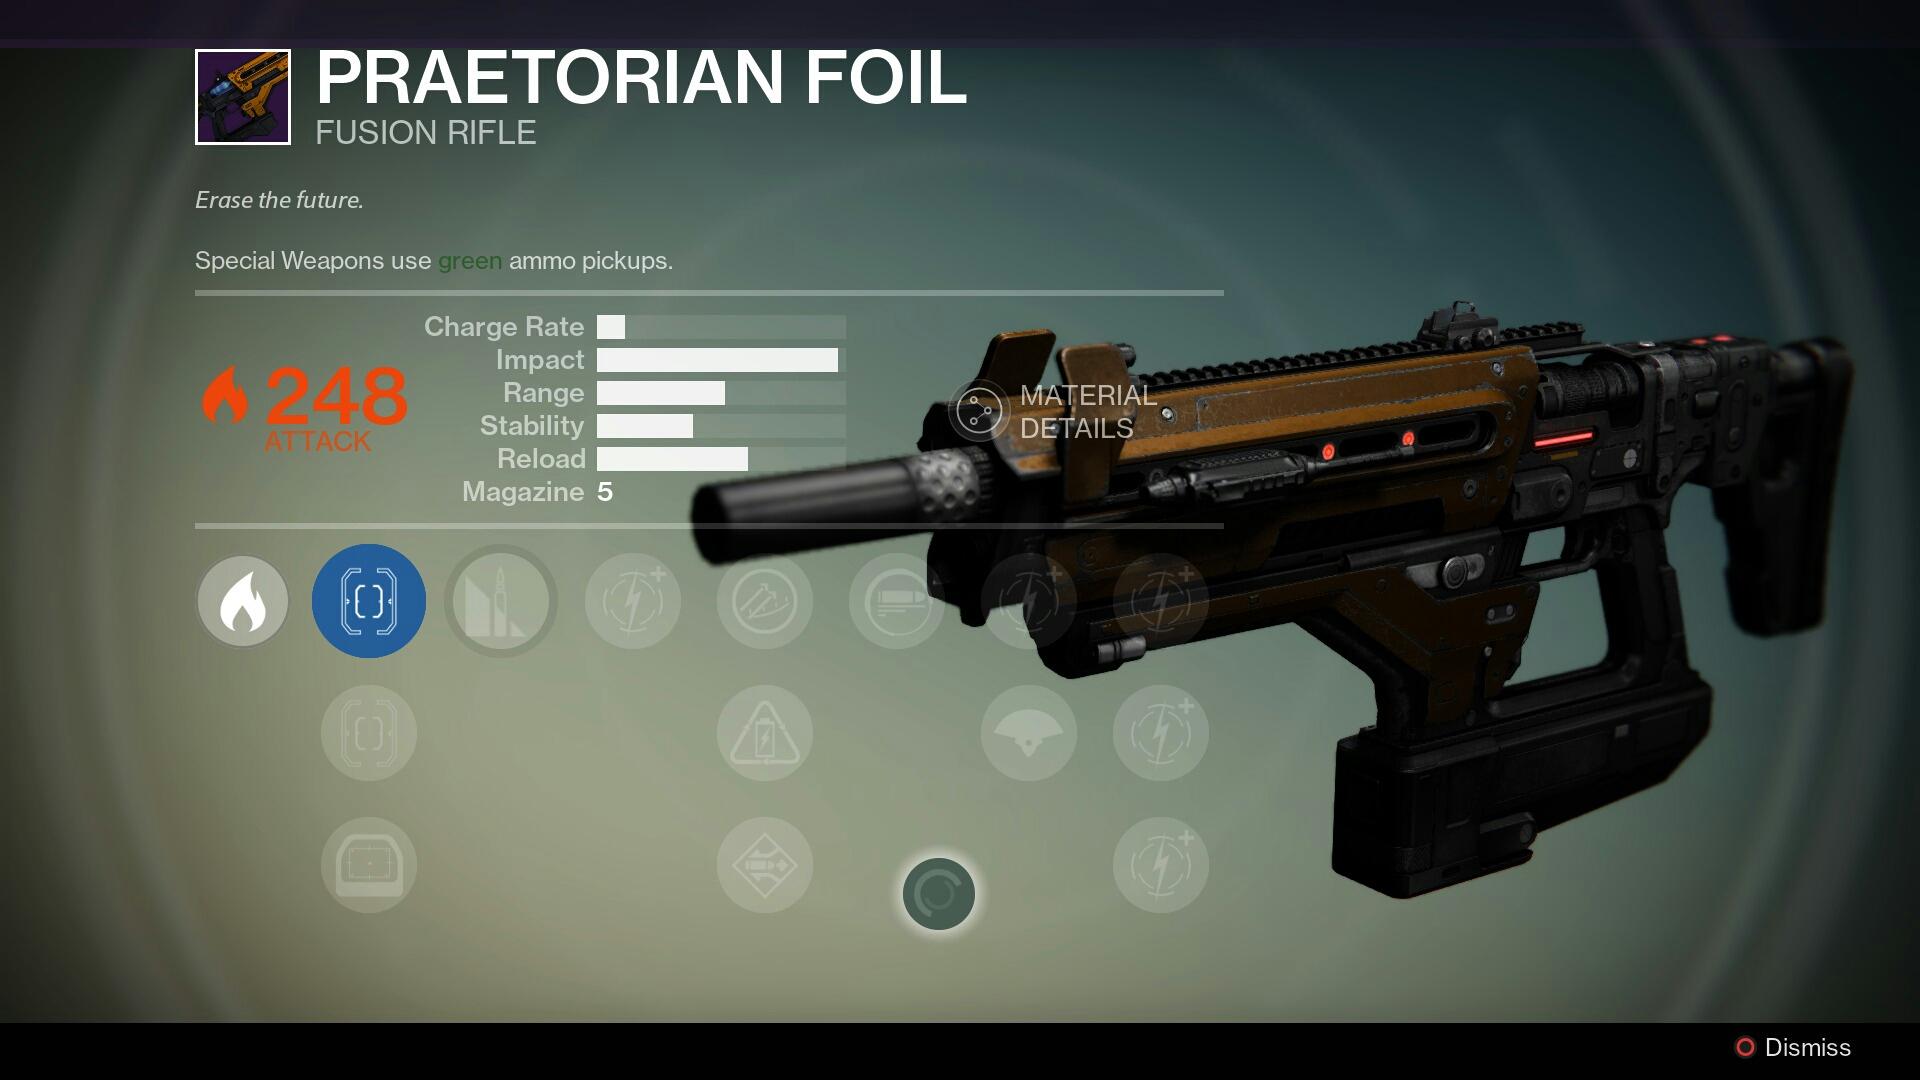 Destiny: Video der Woche sehnt sich nach Praetorian Foil, verflucht Loot-System